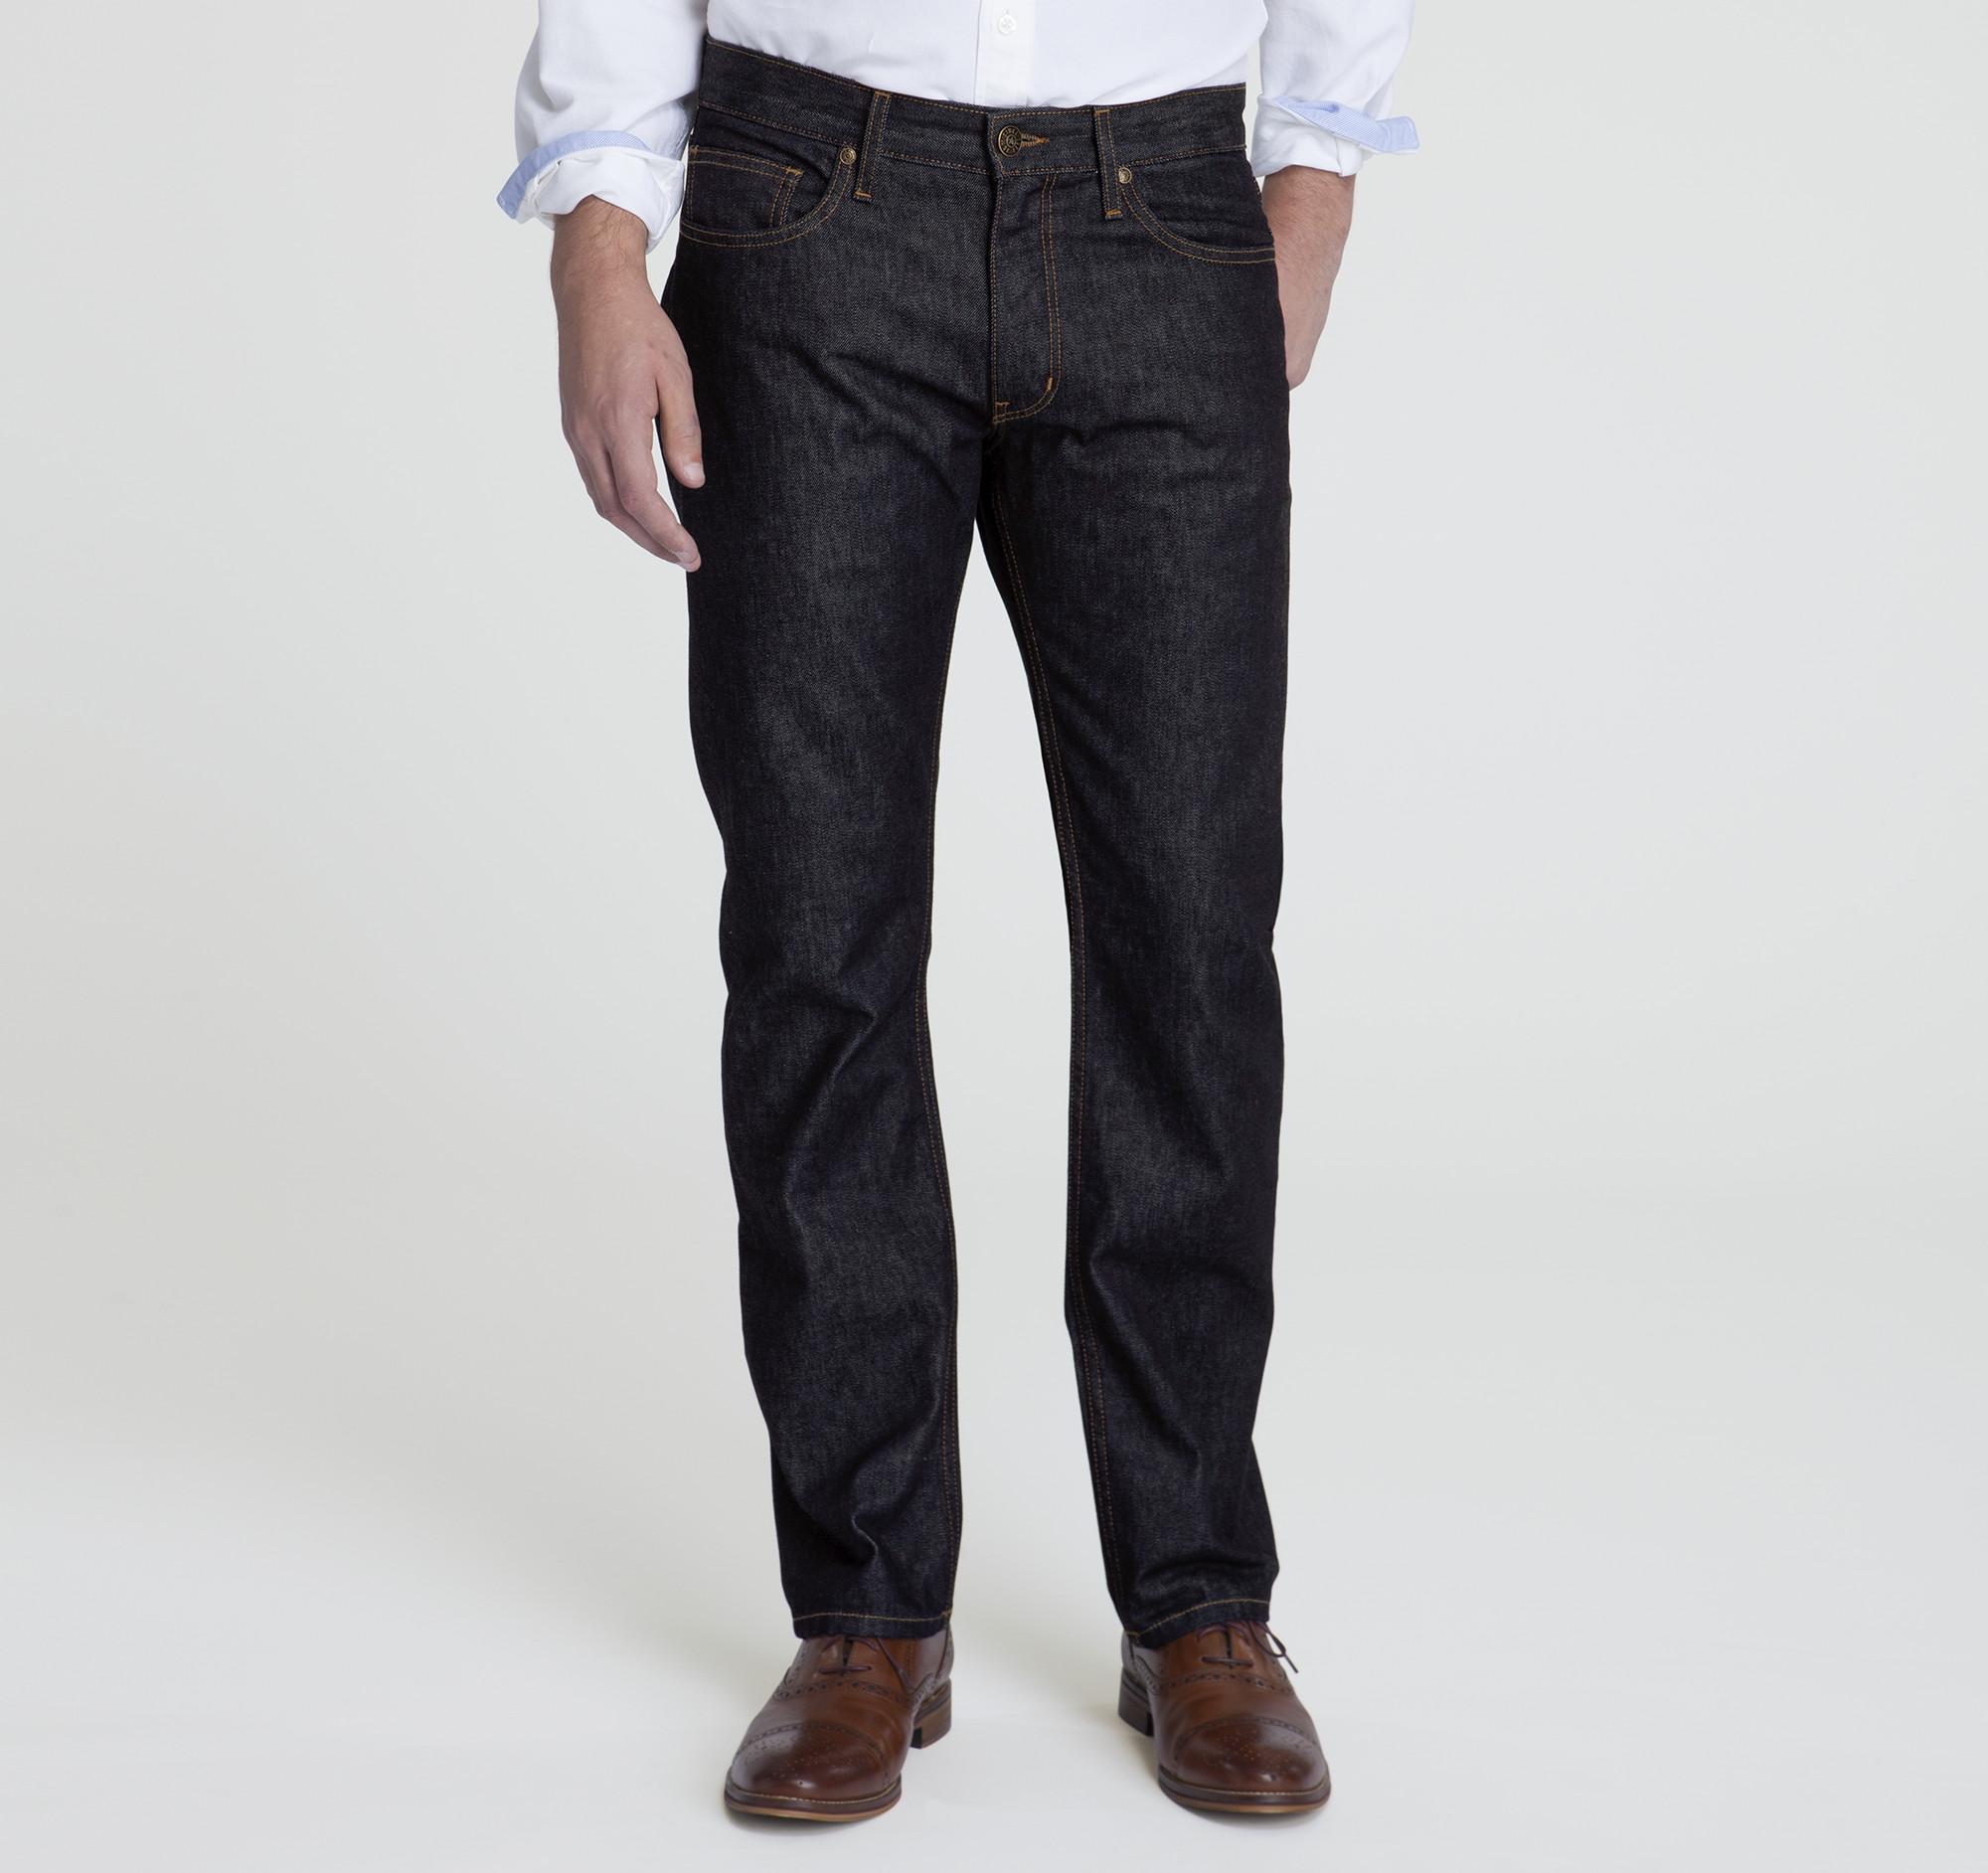 Johnston and Murphy ladies dark jeans size 4